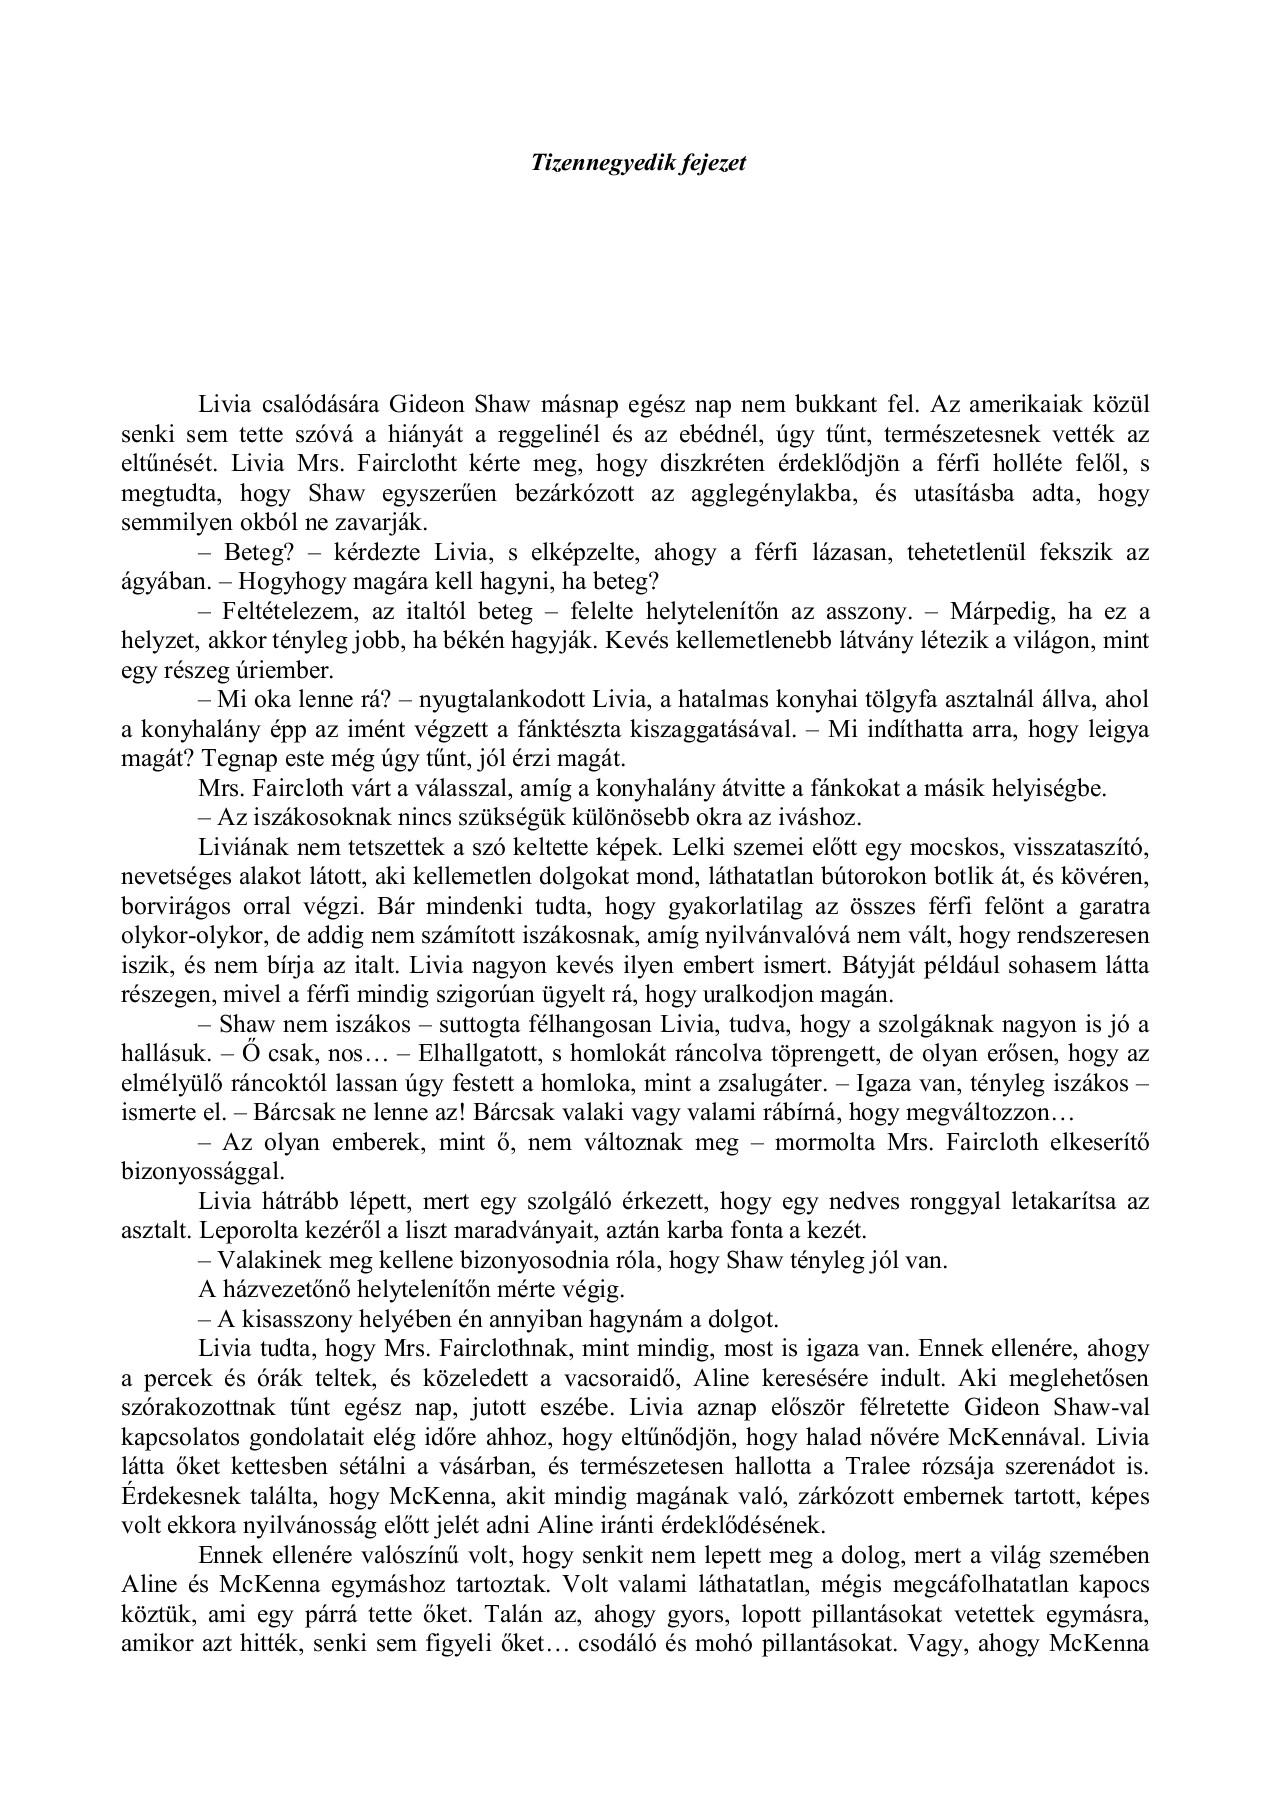 The Cortez - bestgumi.hu user profil - Aktivitás